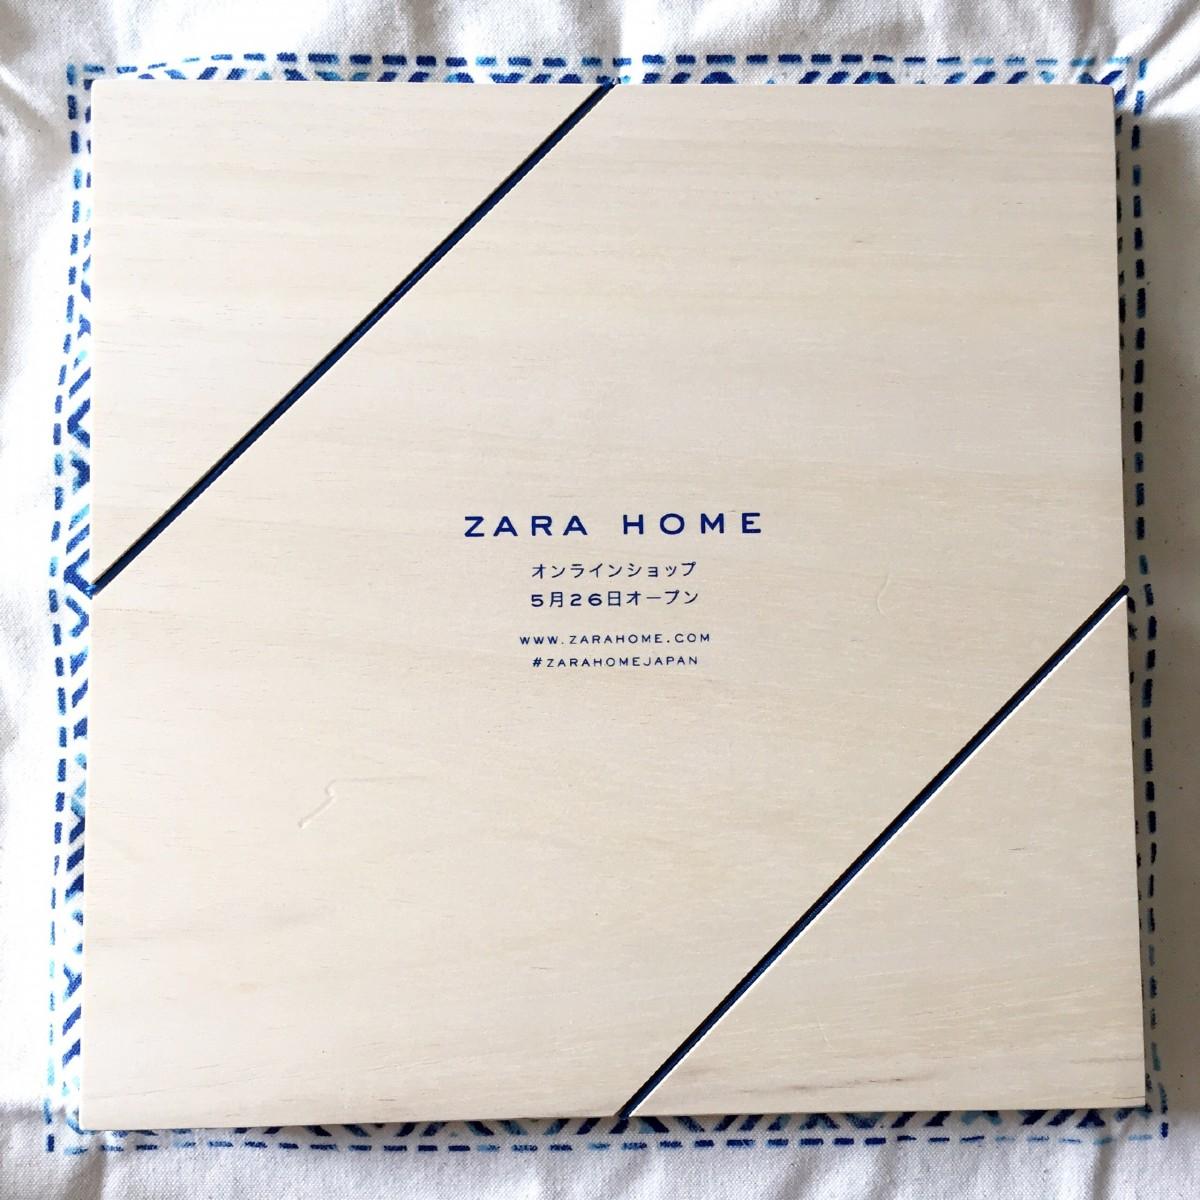 ZARA HOME オンラインショップがついにOPEN!